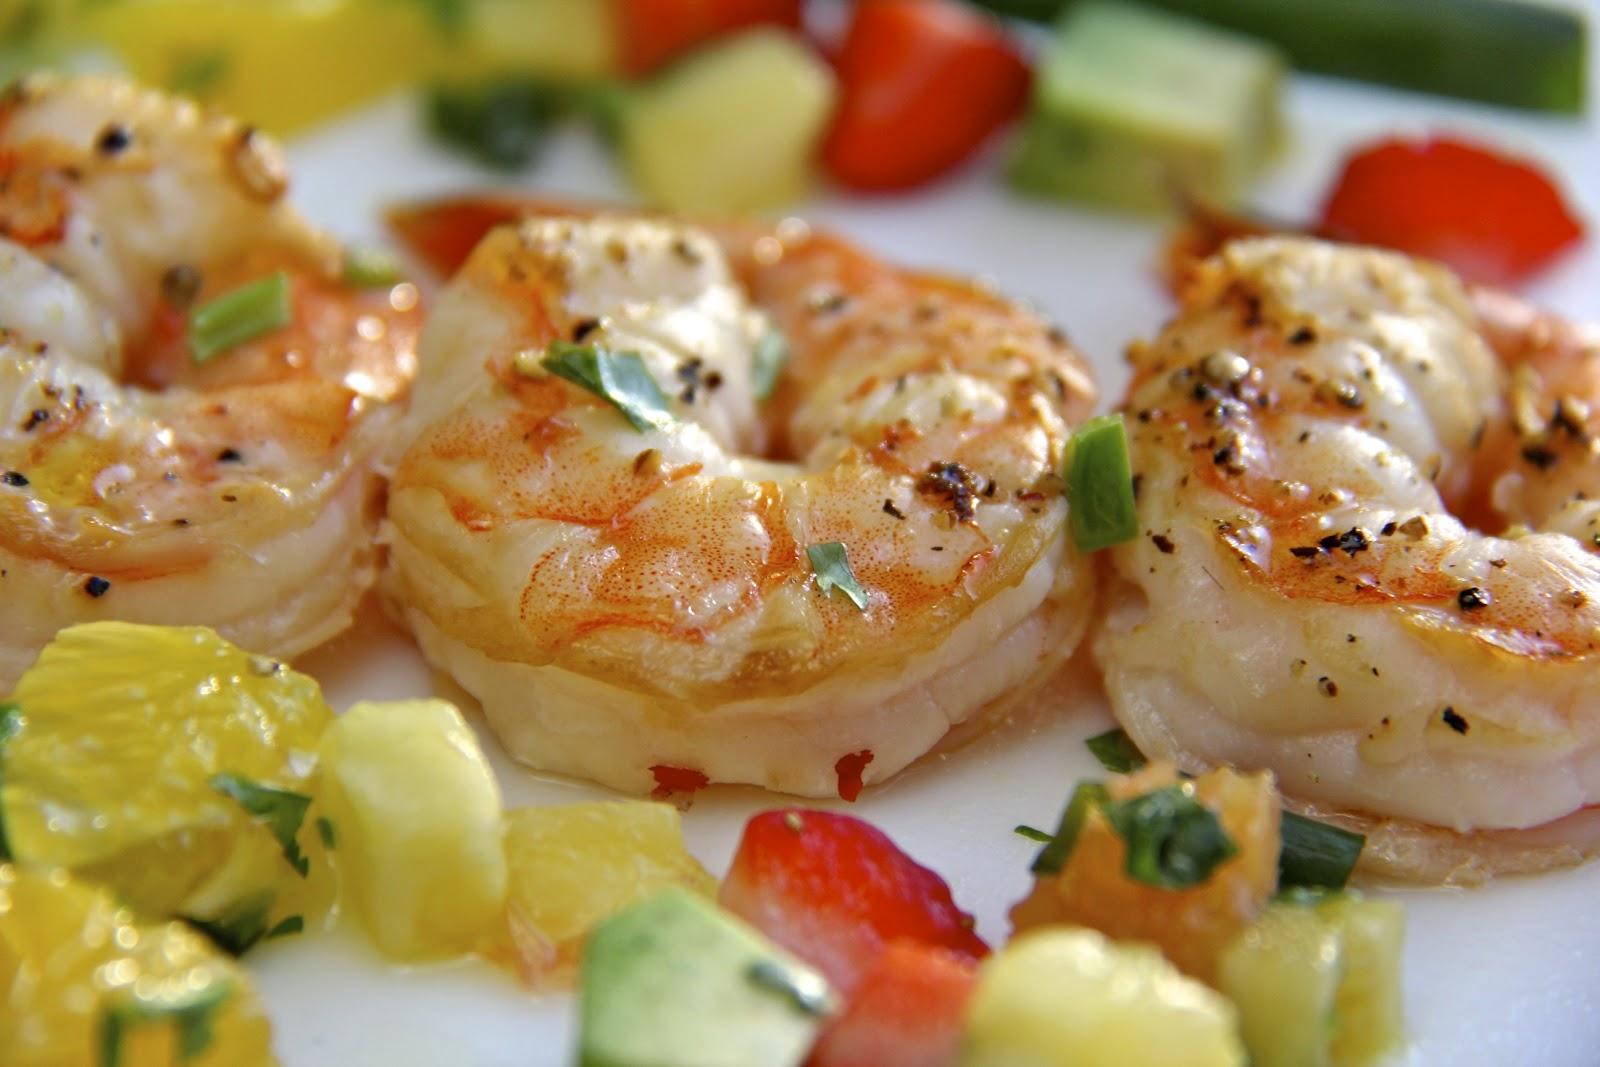 Broiled Coconut Shrimp | The Café Sucre Farine